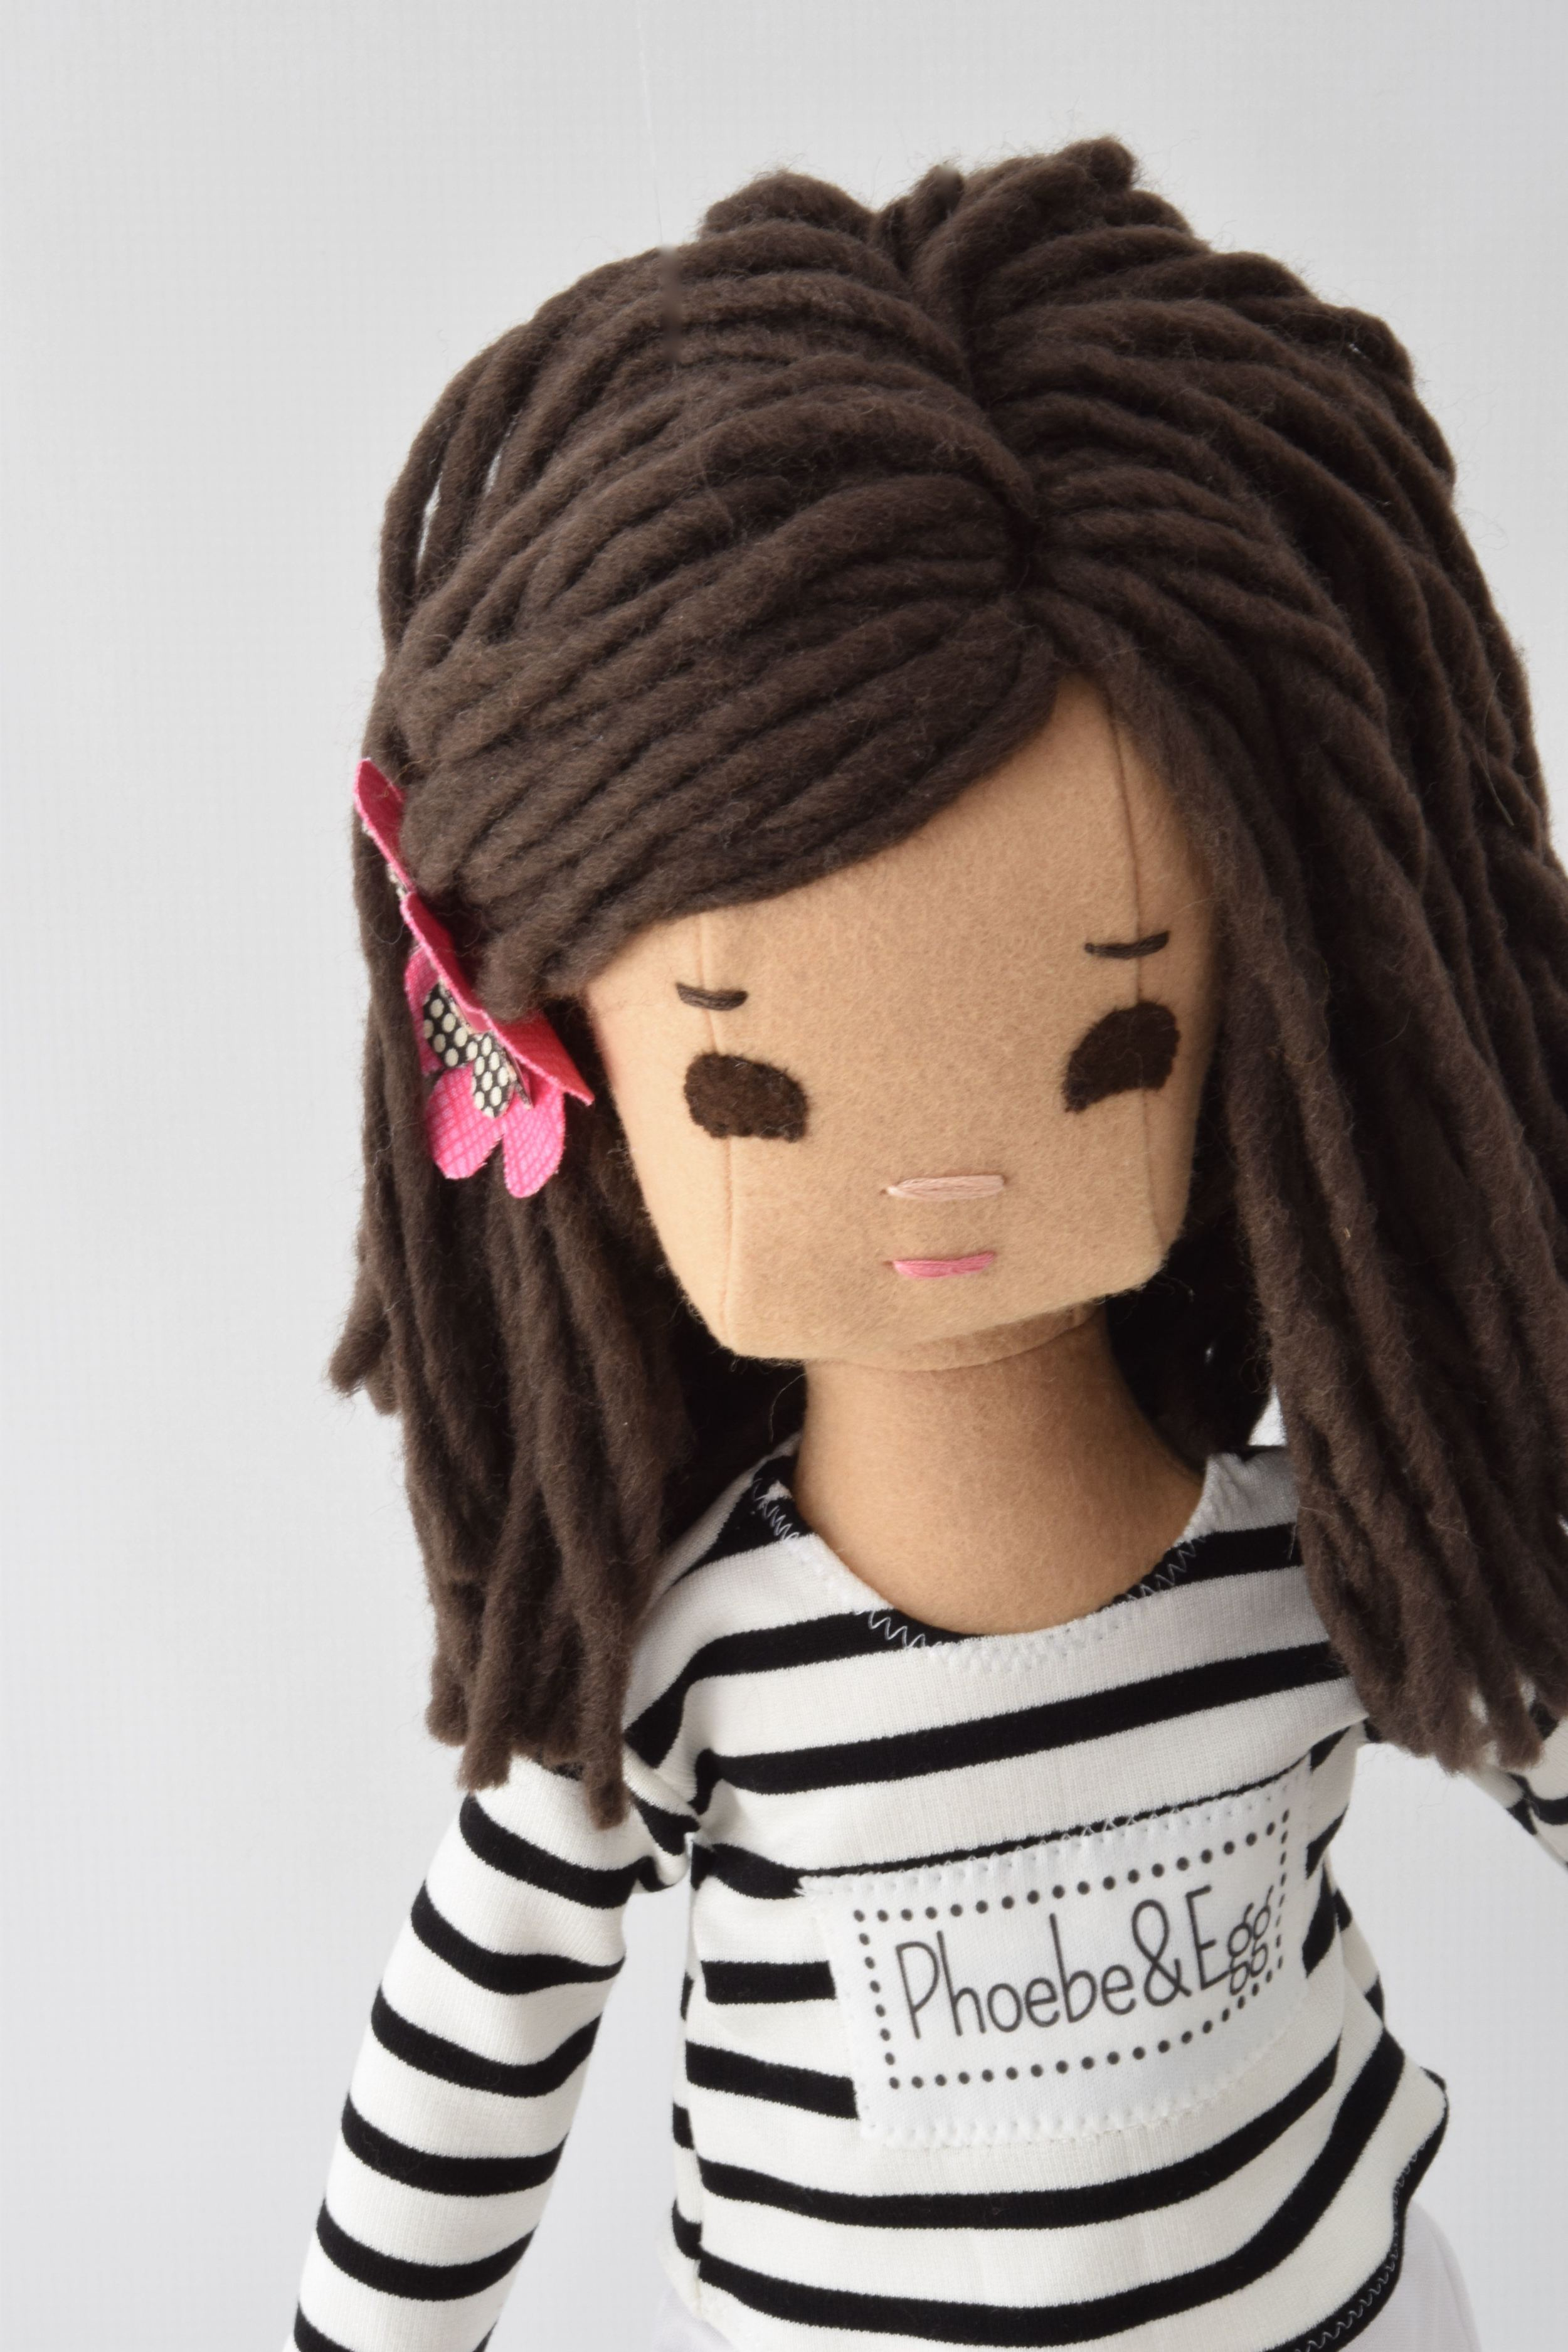 New custom doll